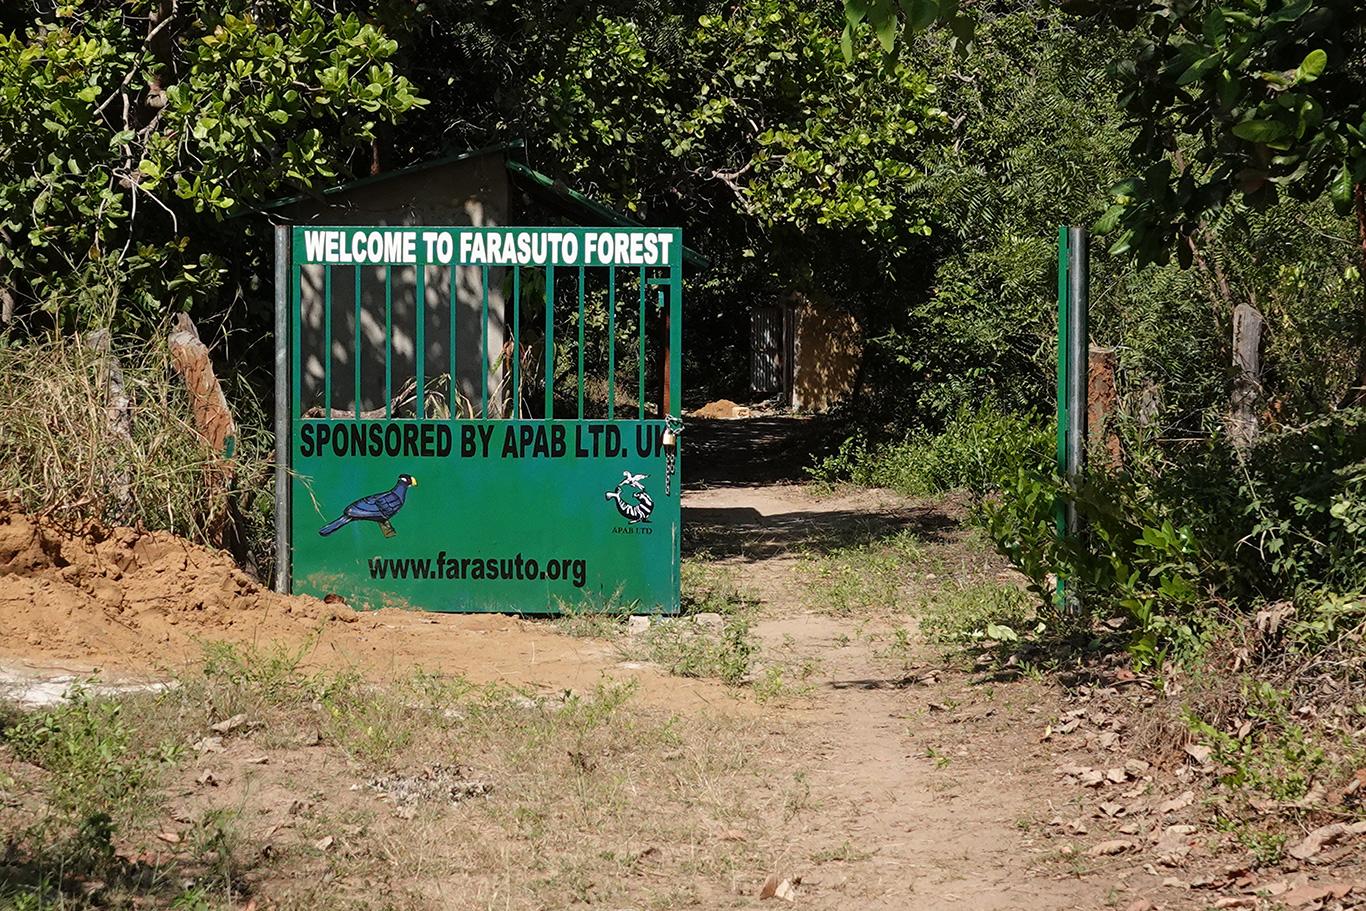 Farasuto Forest, Farasuto, The Gambia.